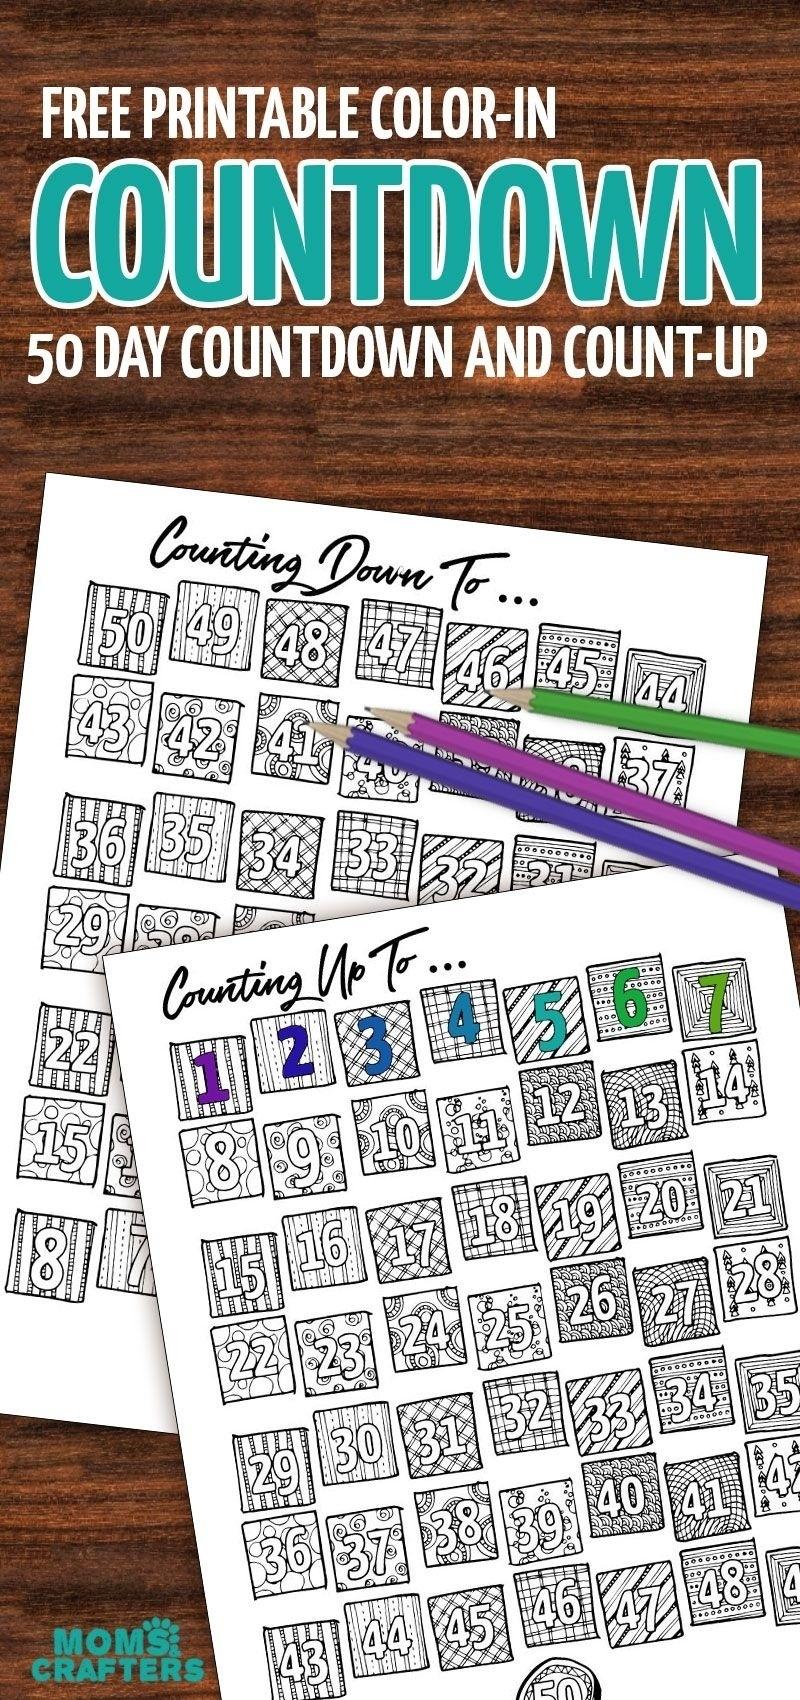 Countdown Calendar For Computer Desktop • Printable Blank Calendar_Countdown Calendar For Computer Desktop